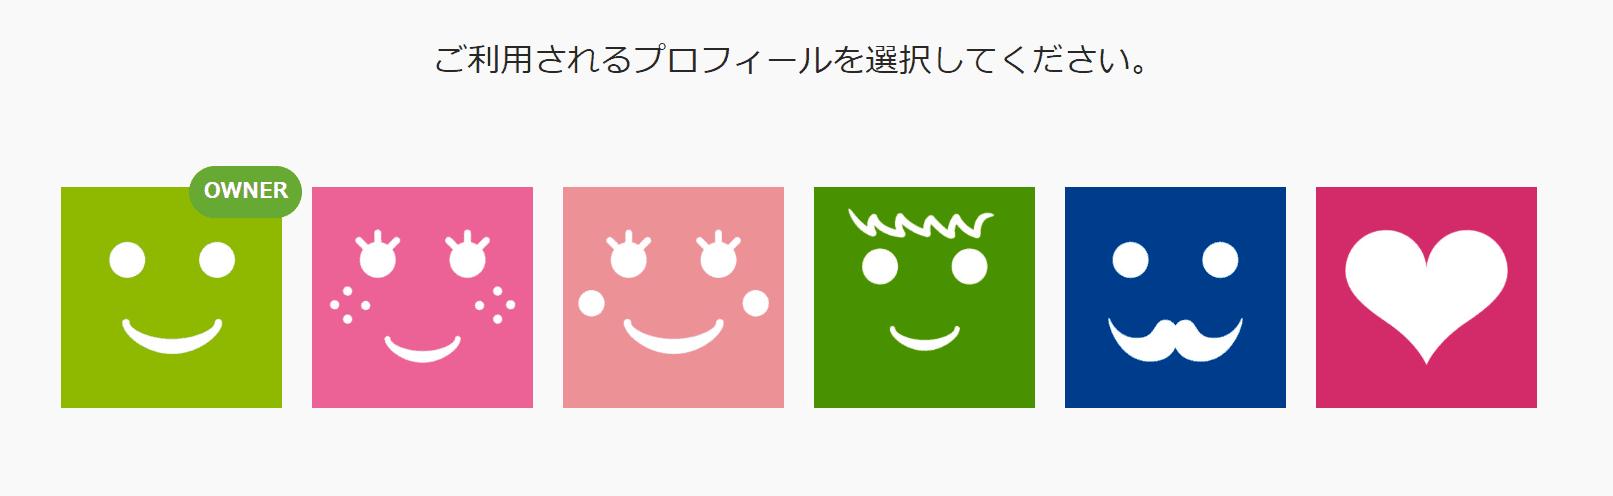 【Huluアカウント登録方法】Hulu(フールー)アカウント登録で2週間無料トライアル!フールーの申し込み手順まとめ|アカウント共有・解約方法なども解説|アカウントを共有する方法:Huluは最大6つのプロフィールを設定可能